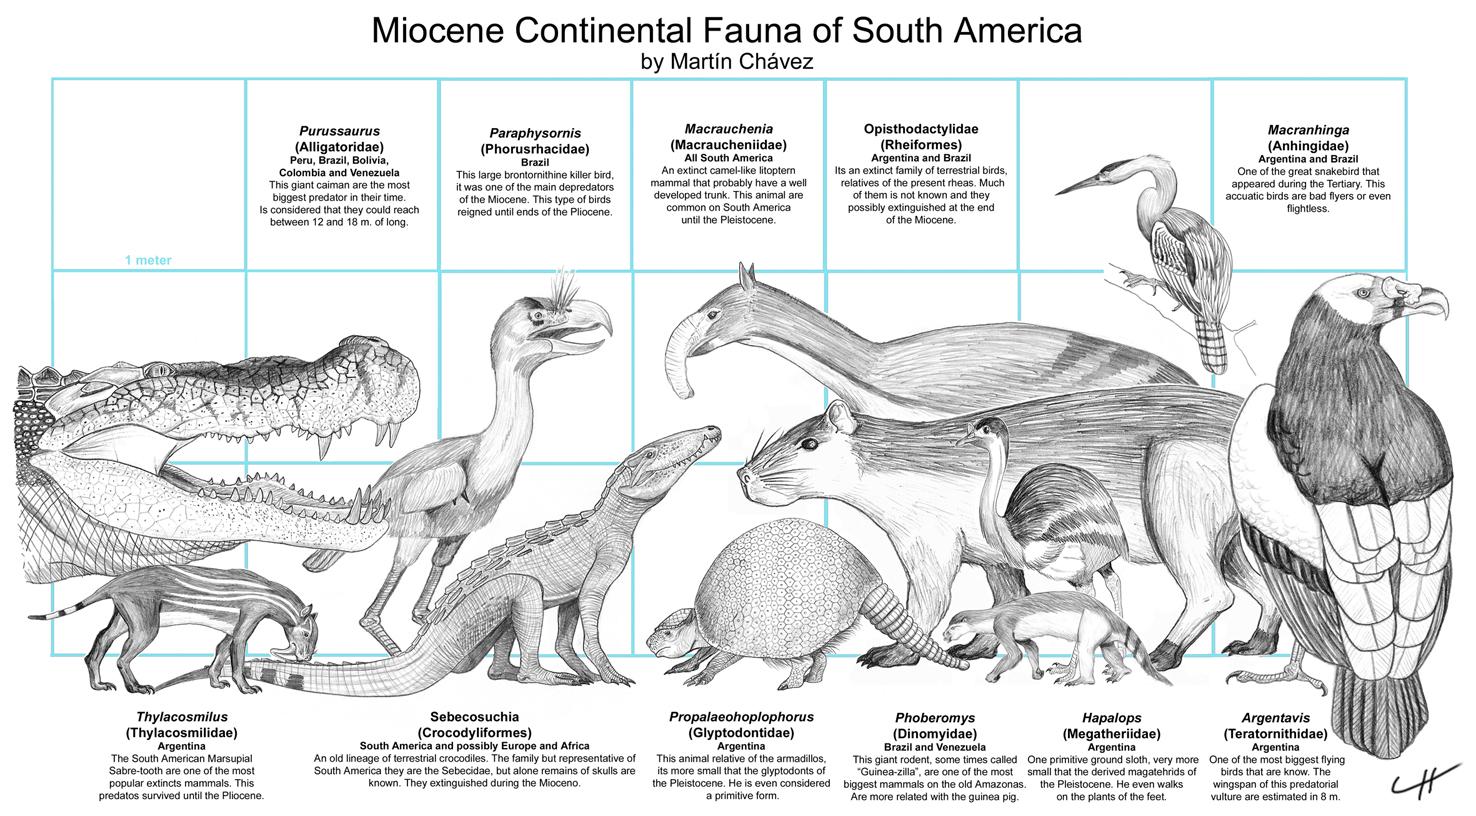 Miocene Fauna of South America